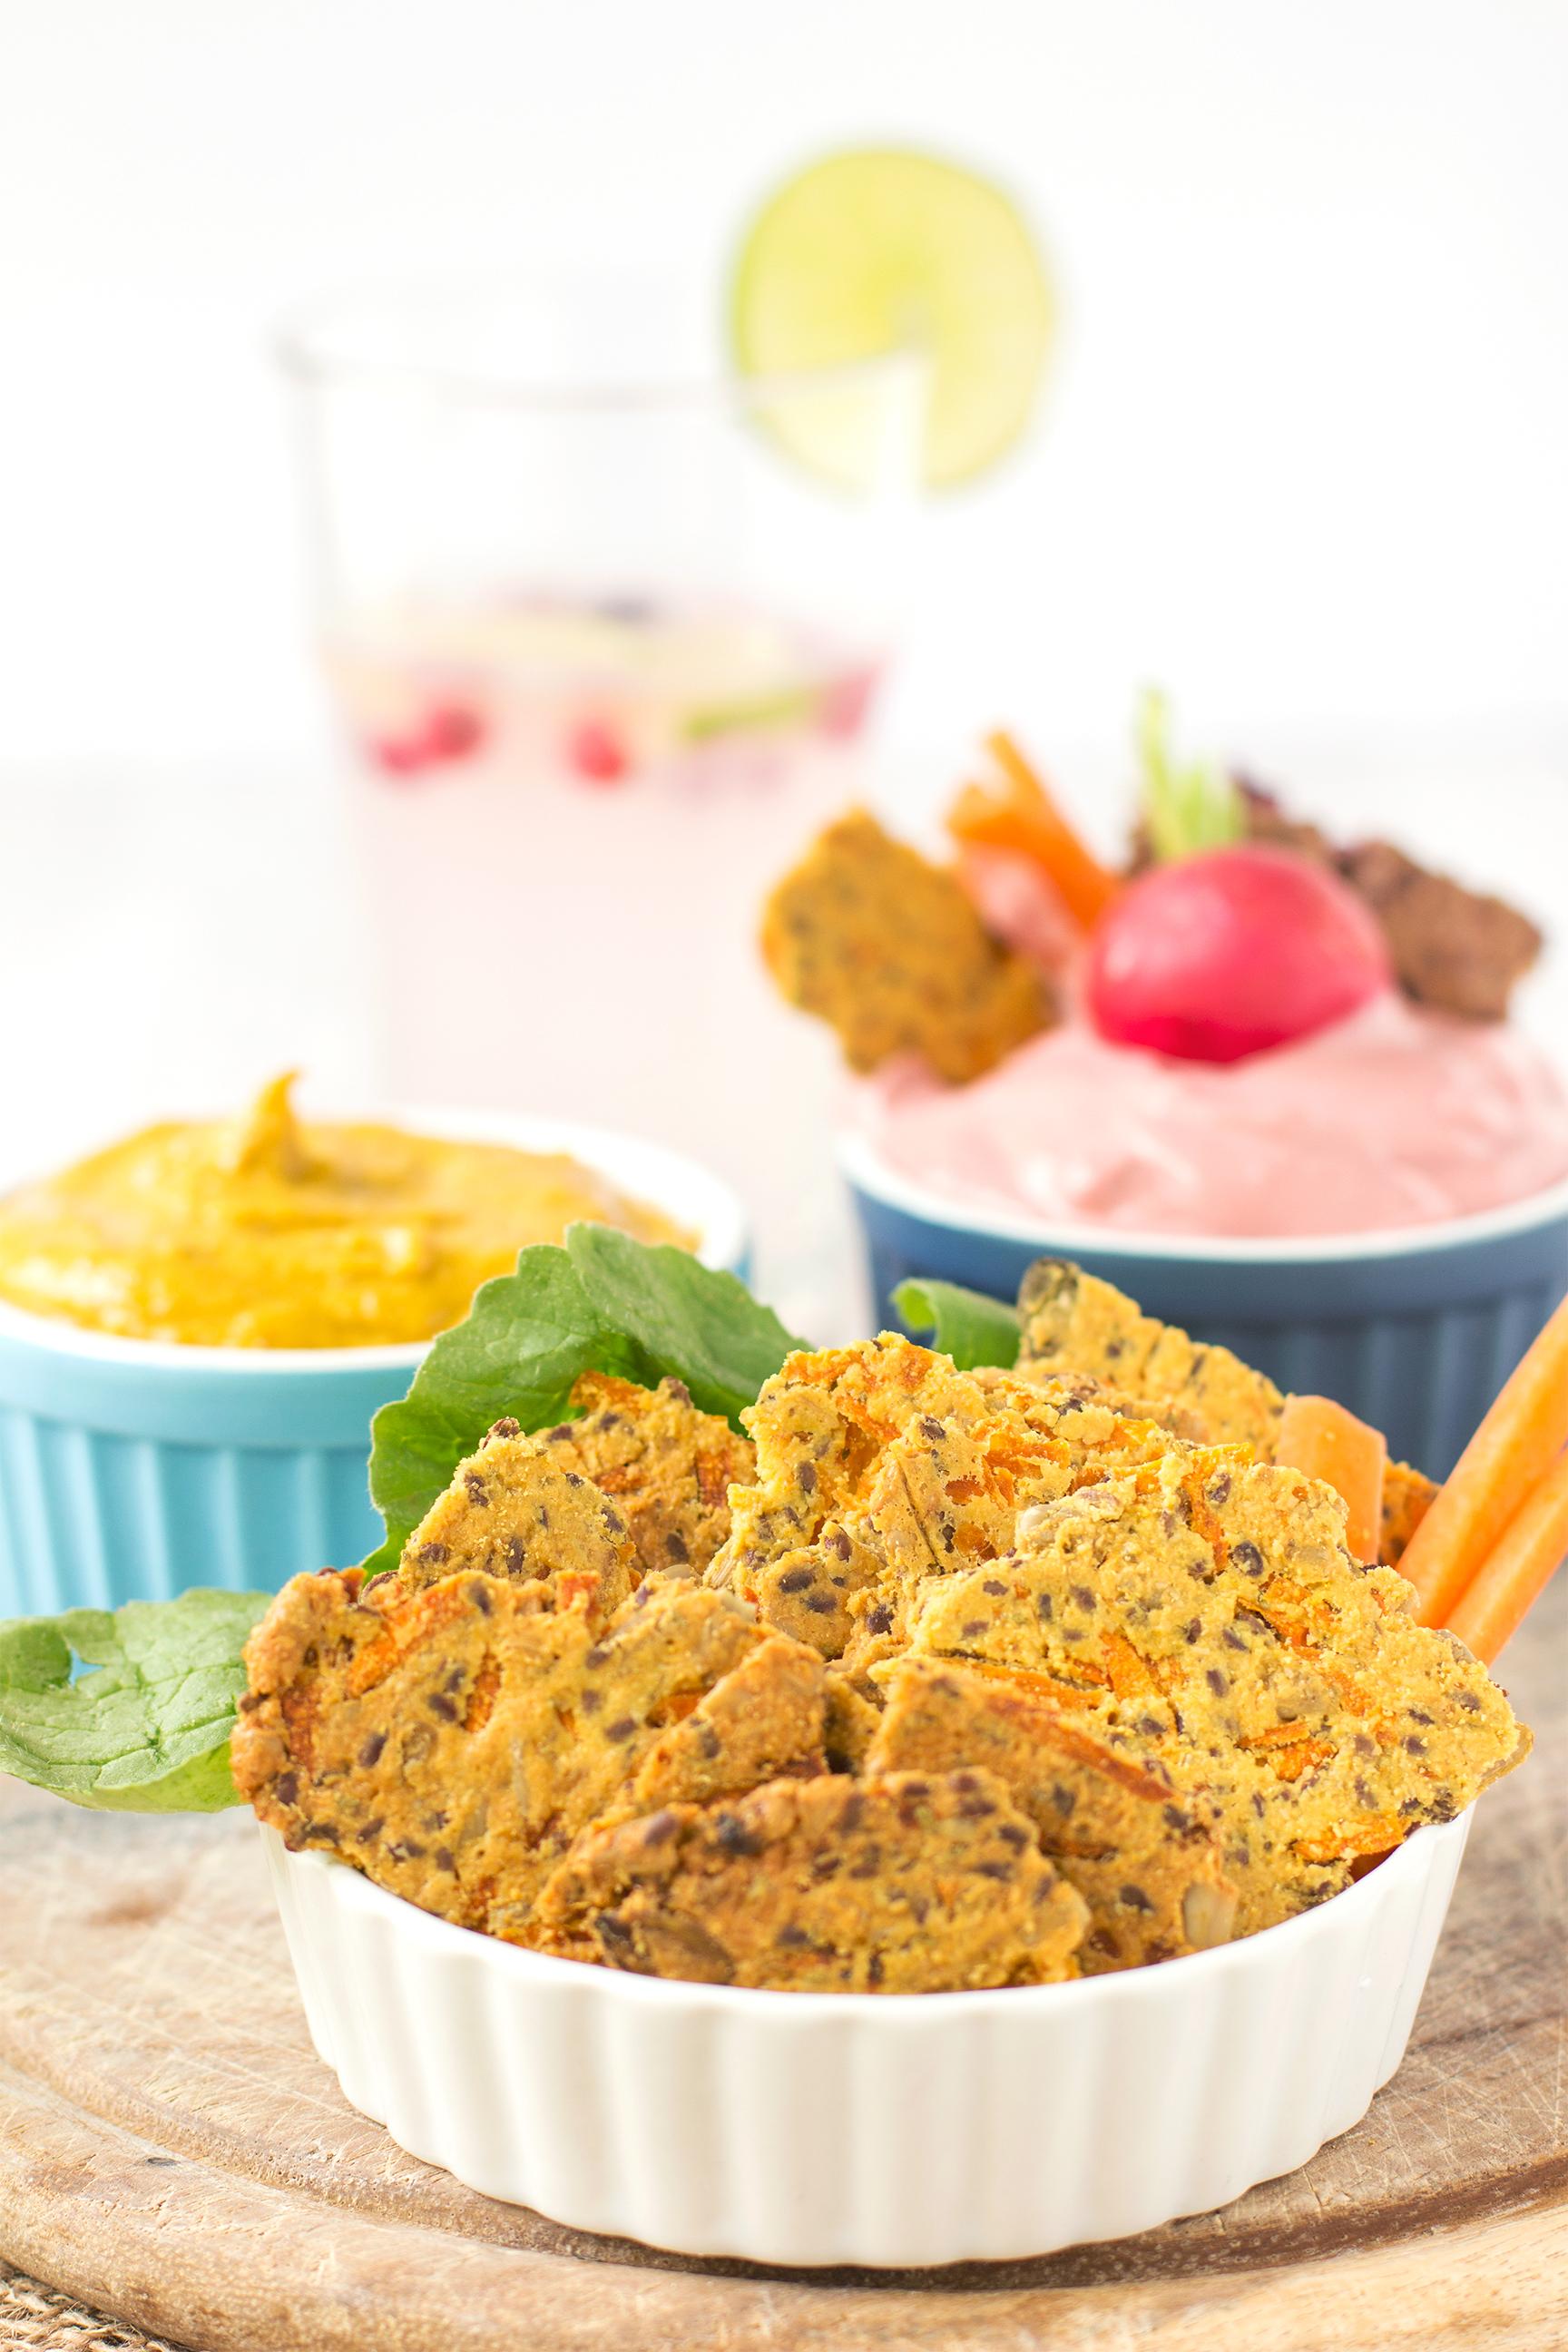 SUPERFOOD CRACKERS alle CAROTE e MANDORLE facili e veloci. #Senzaglutine #vegan, senza farina, senza olio e buonissimi! | Almond superfood carrot crackers| #vegan #glutenfree oilfree sugarfree